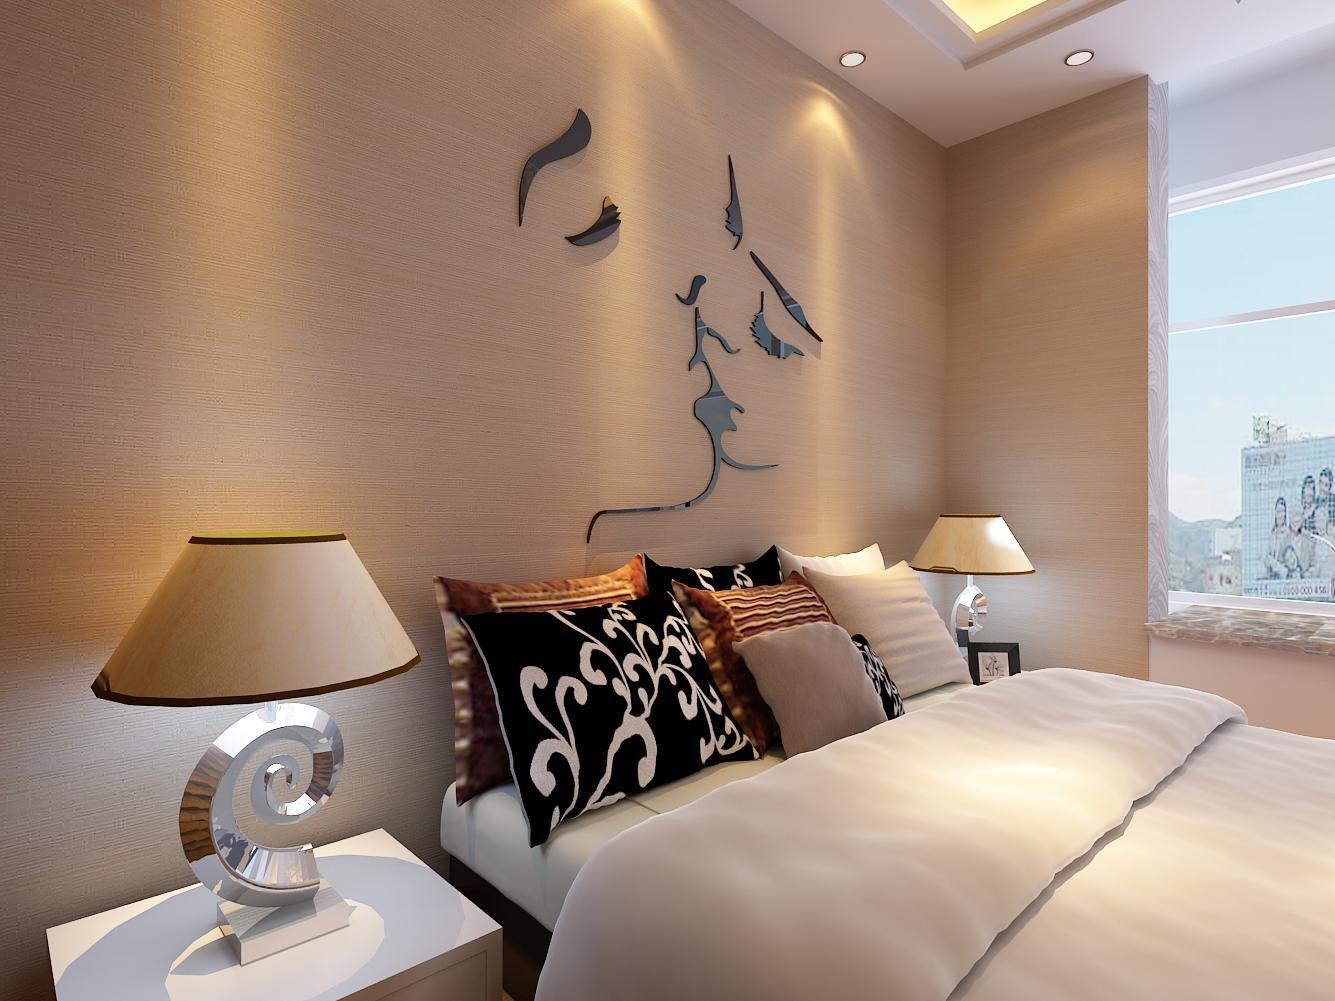 3d Kiss Wall Murals for Living Room Bedroom best feng shui home decor tips